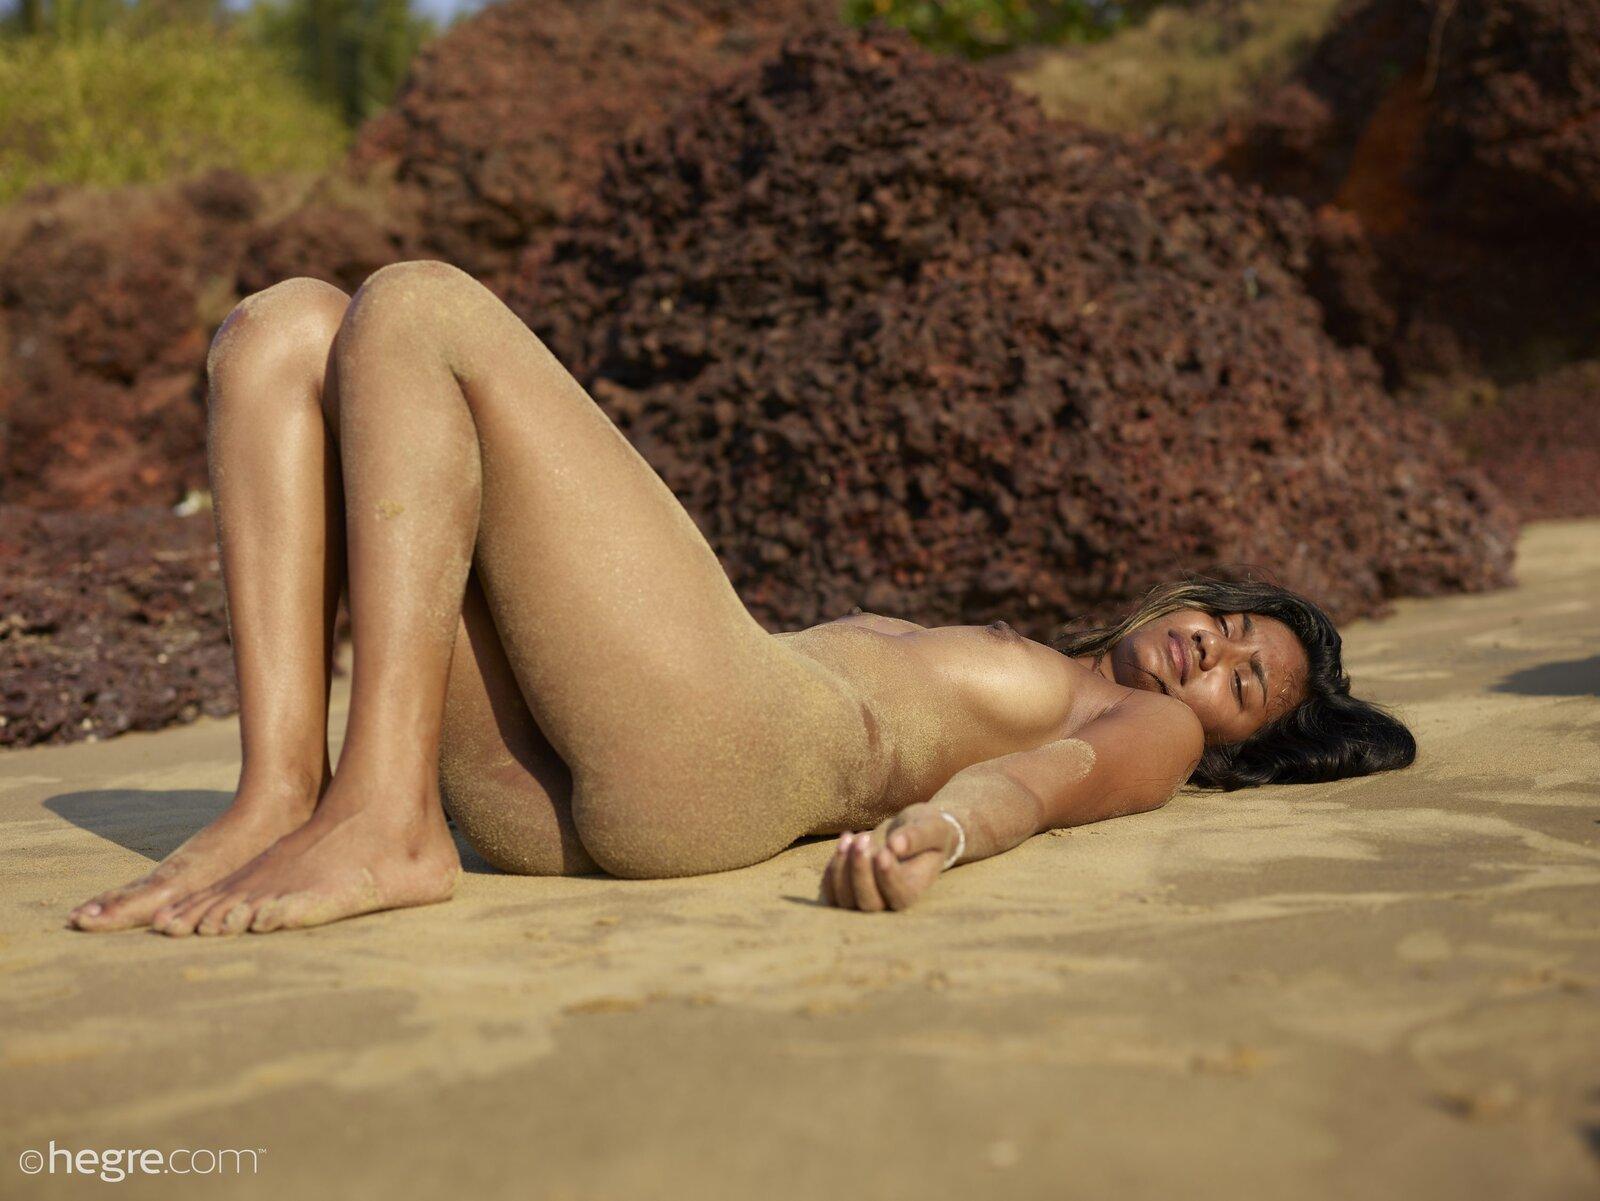 Nuna In Nude Beach In India By Hegre-Art 12 Photos -6918